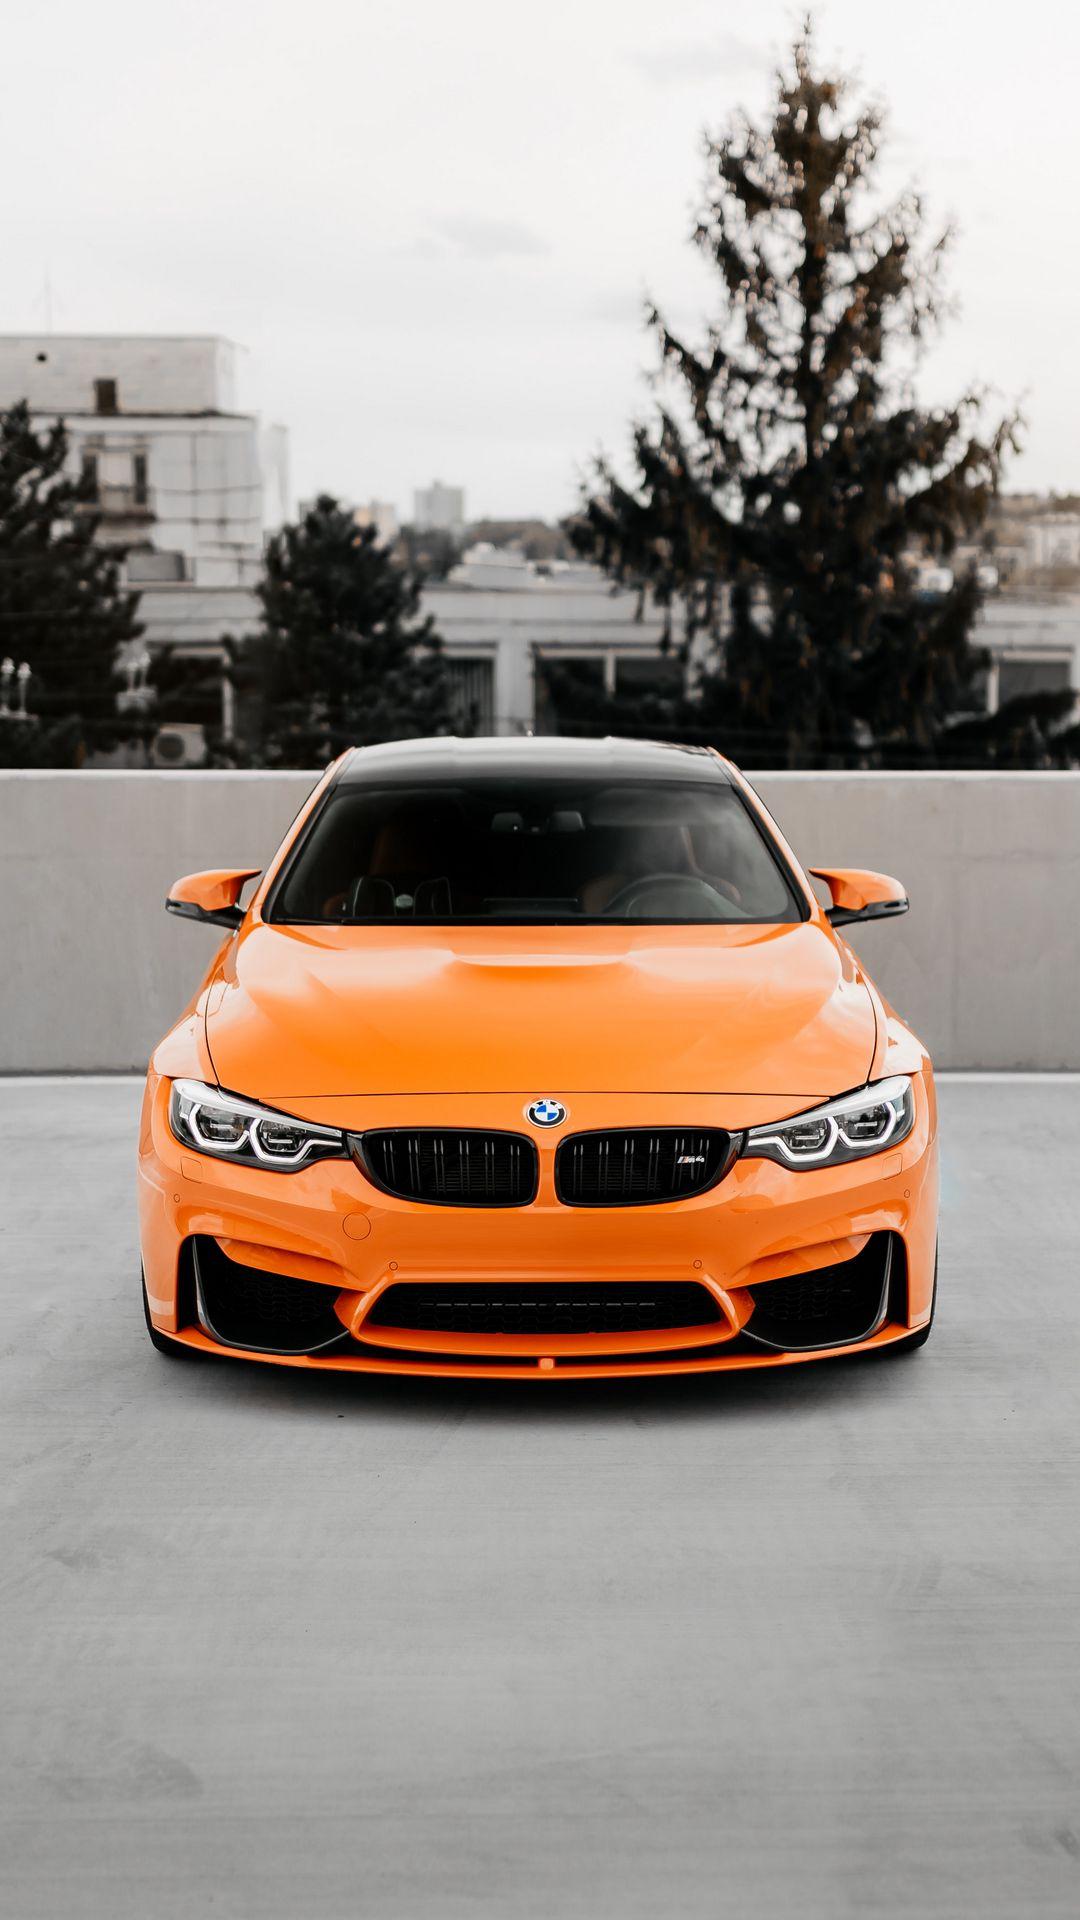 Top Free 4K BMW Wallpapers Download